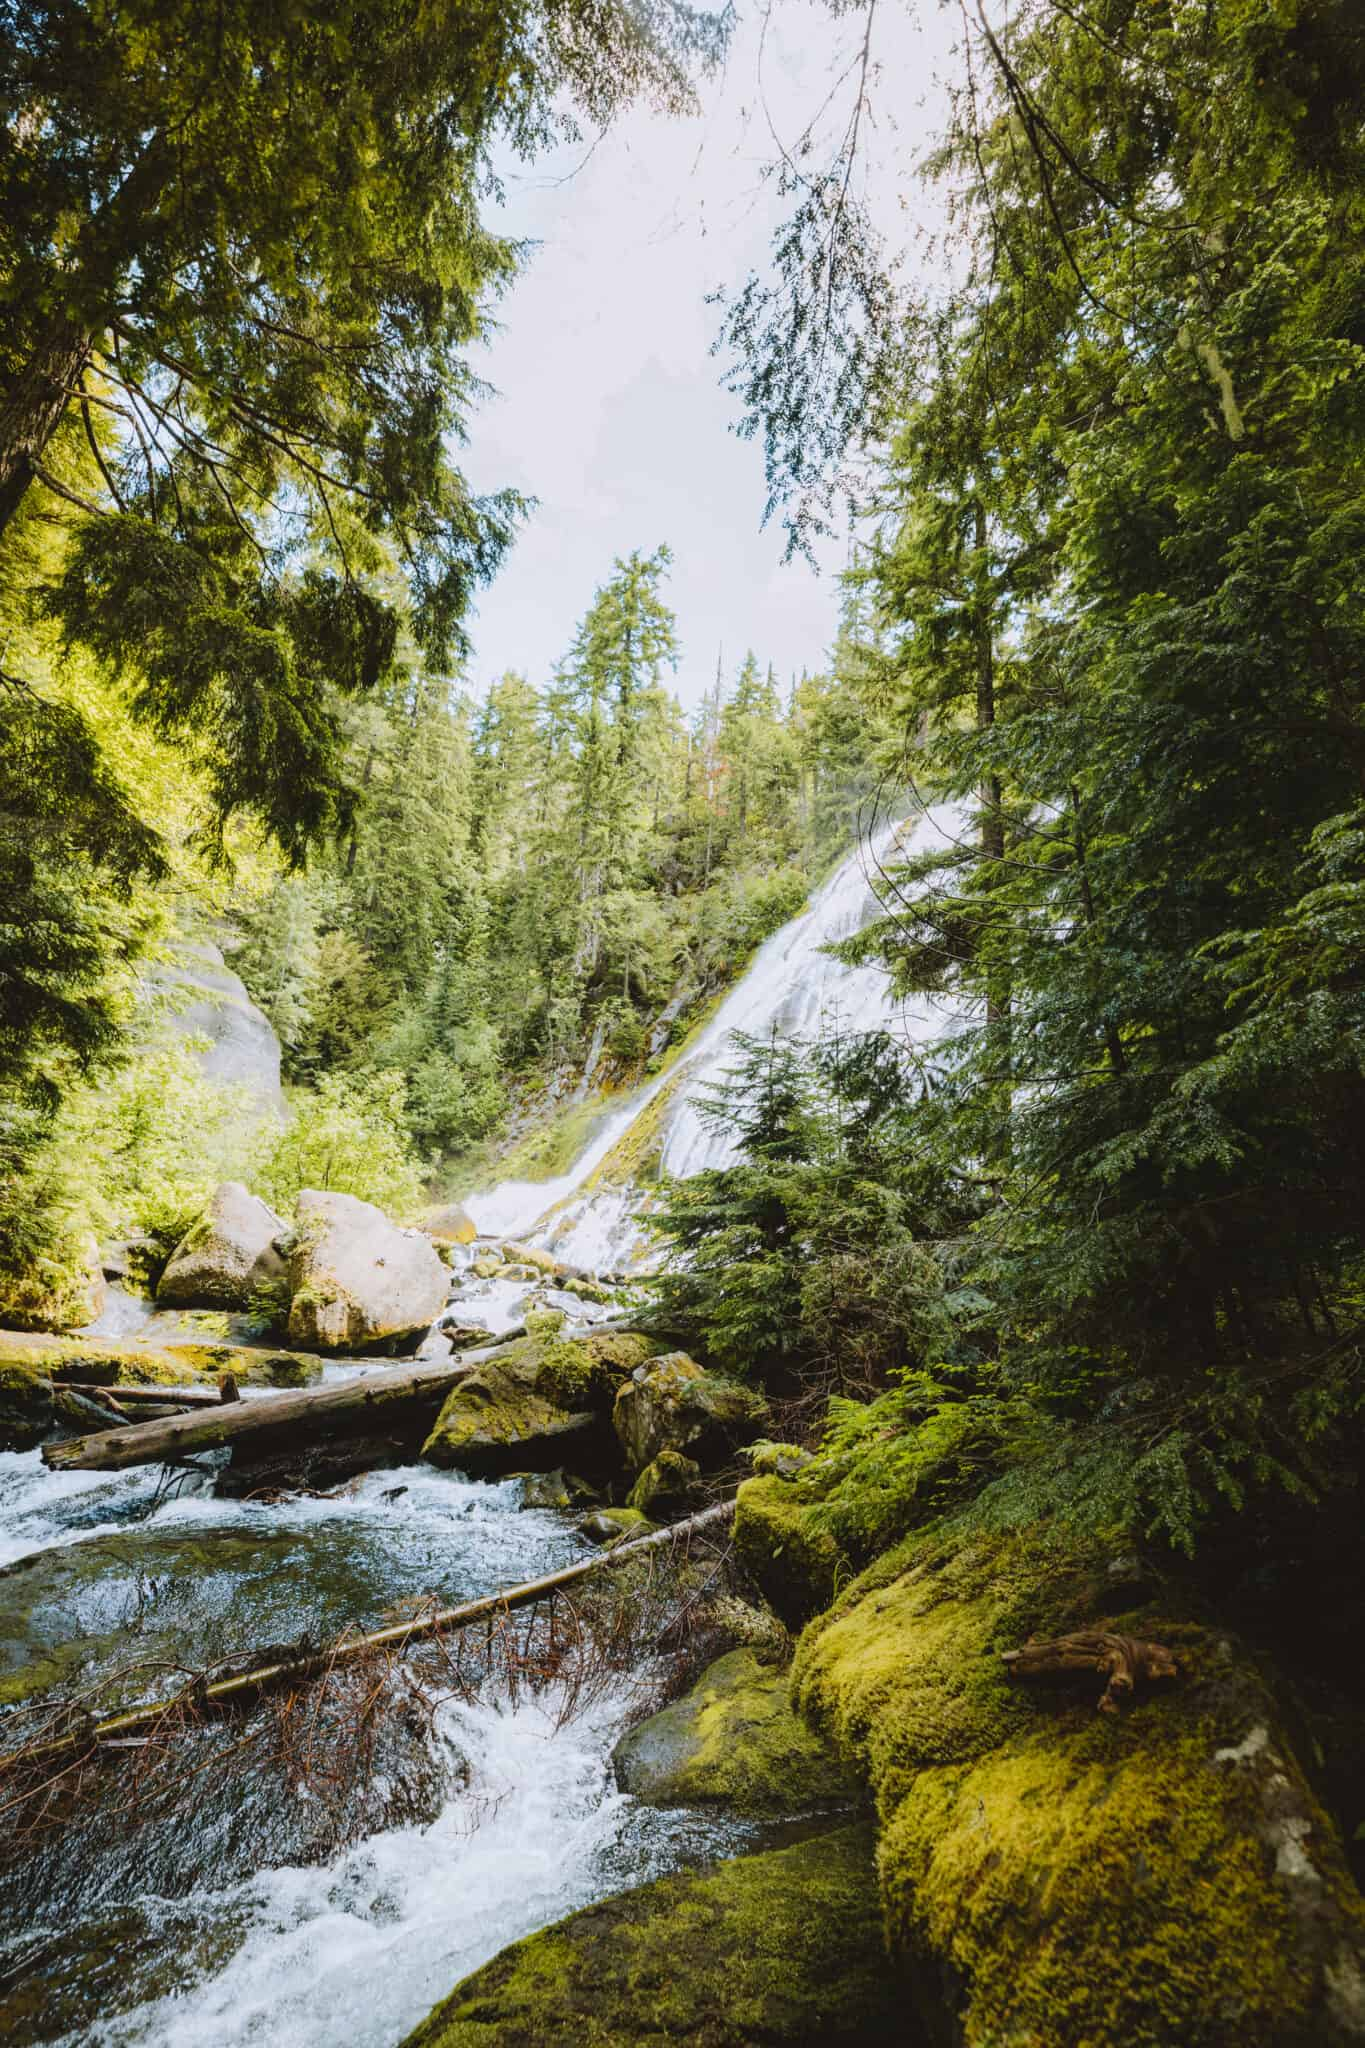 Approaching Diamond Creek Falls on trail